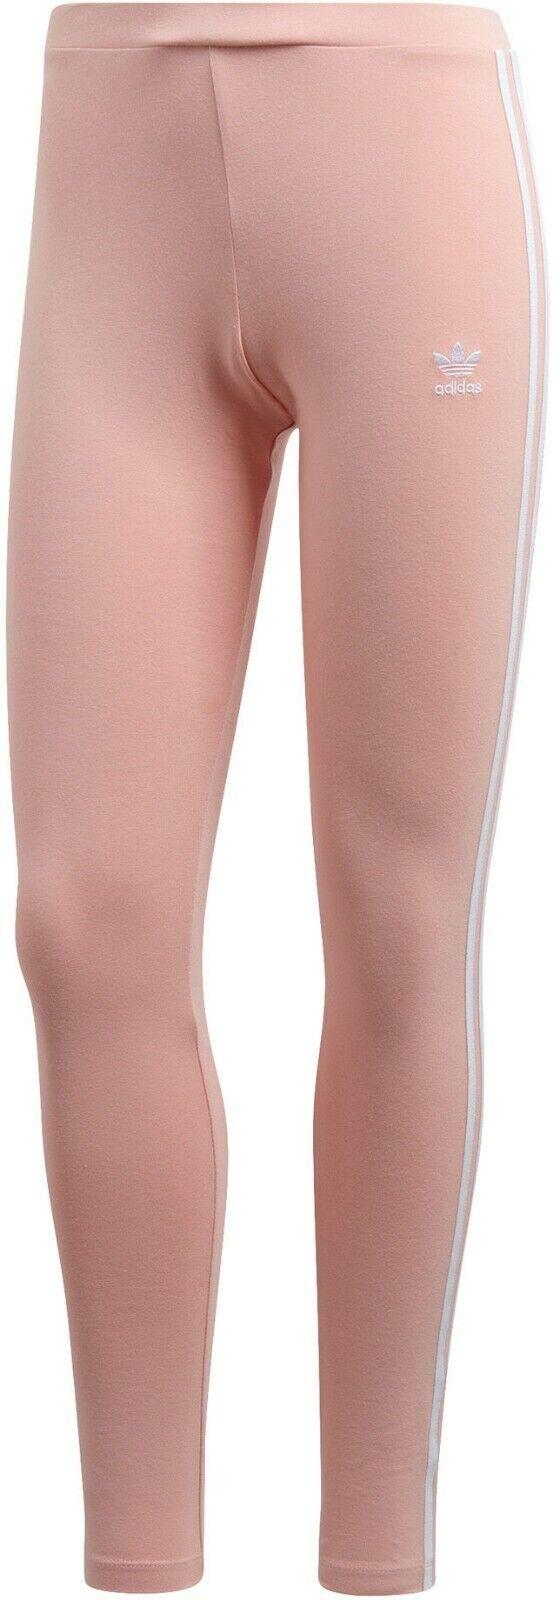 Adidas Originals Women's 3 Stripes Leggings Dust Pink DV2617 d